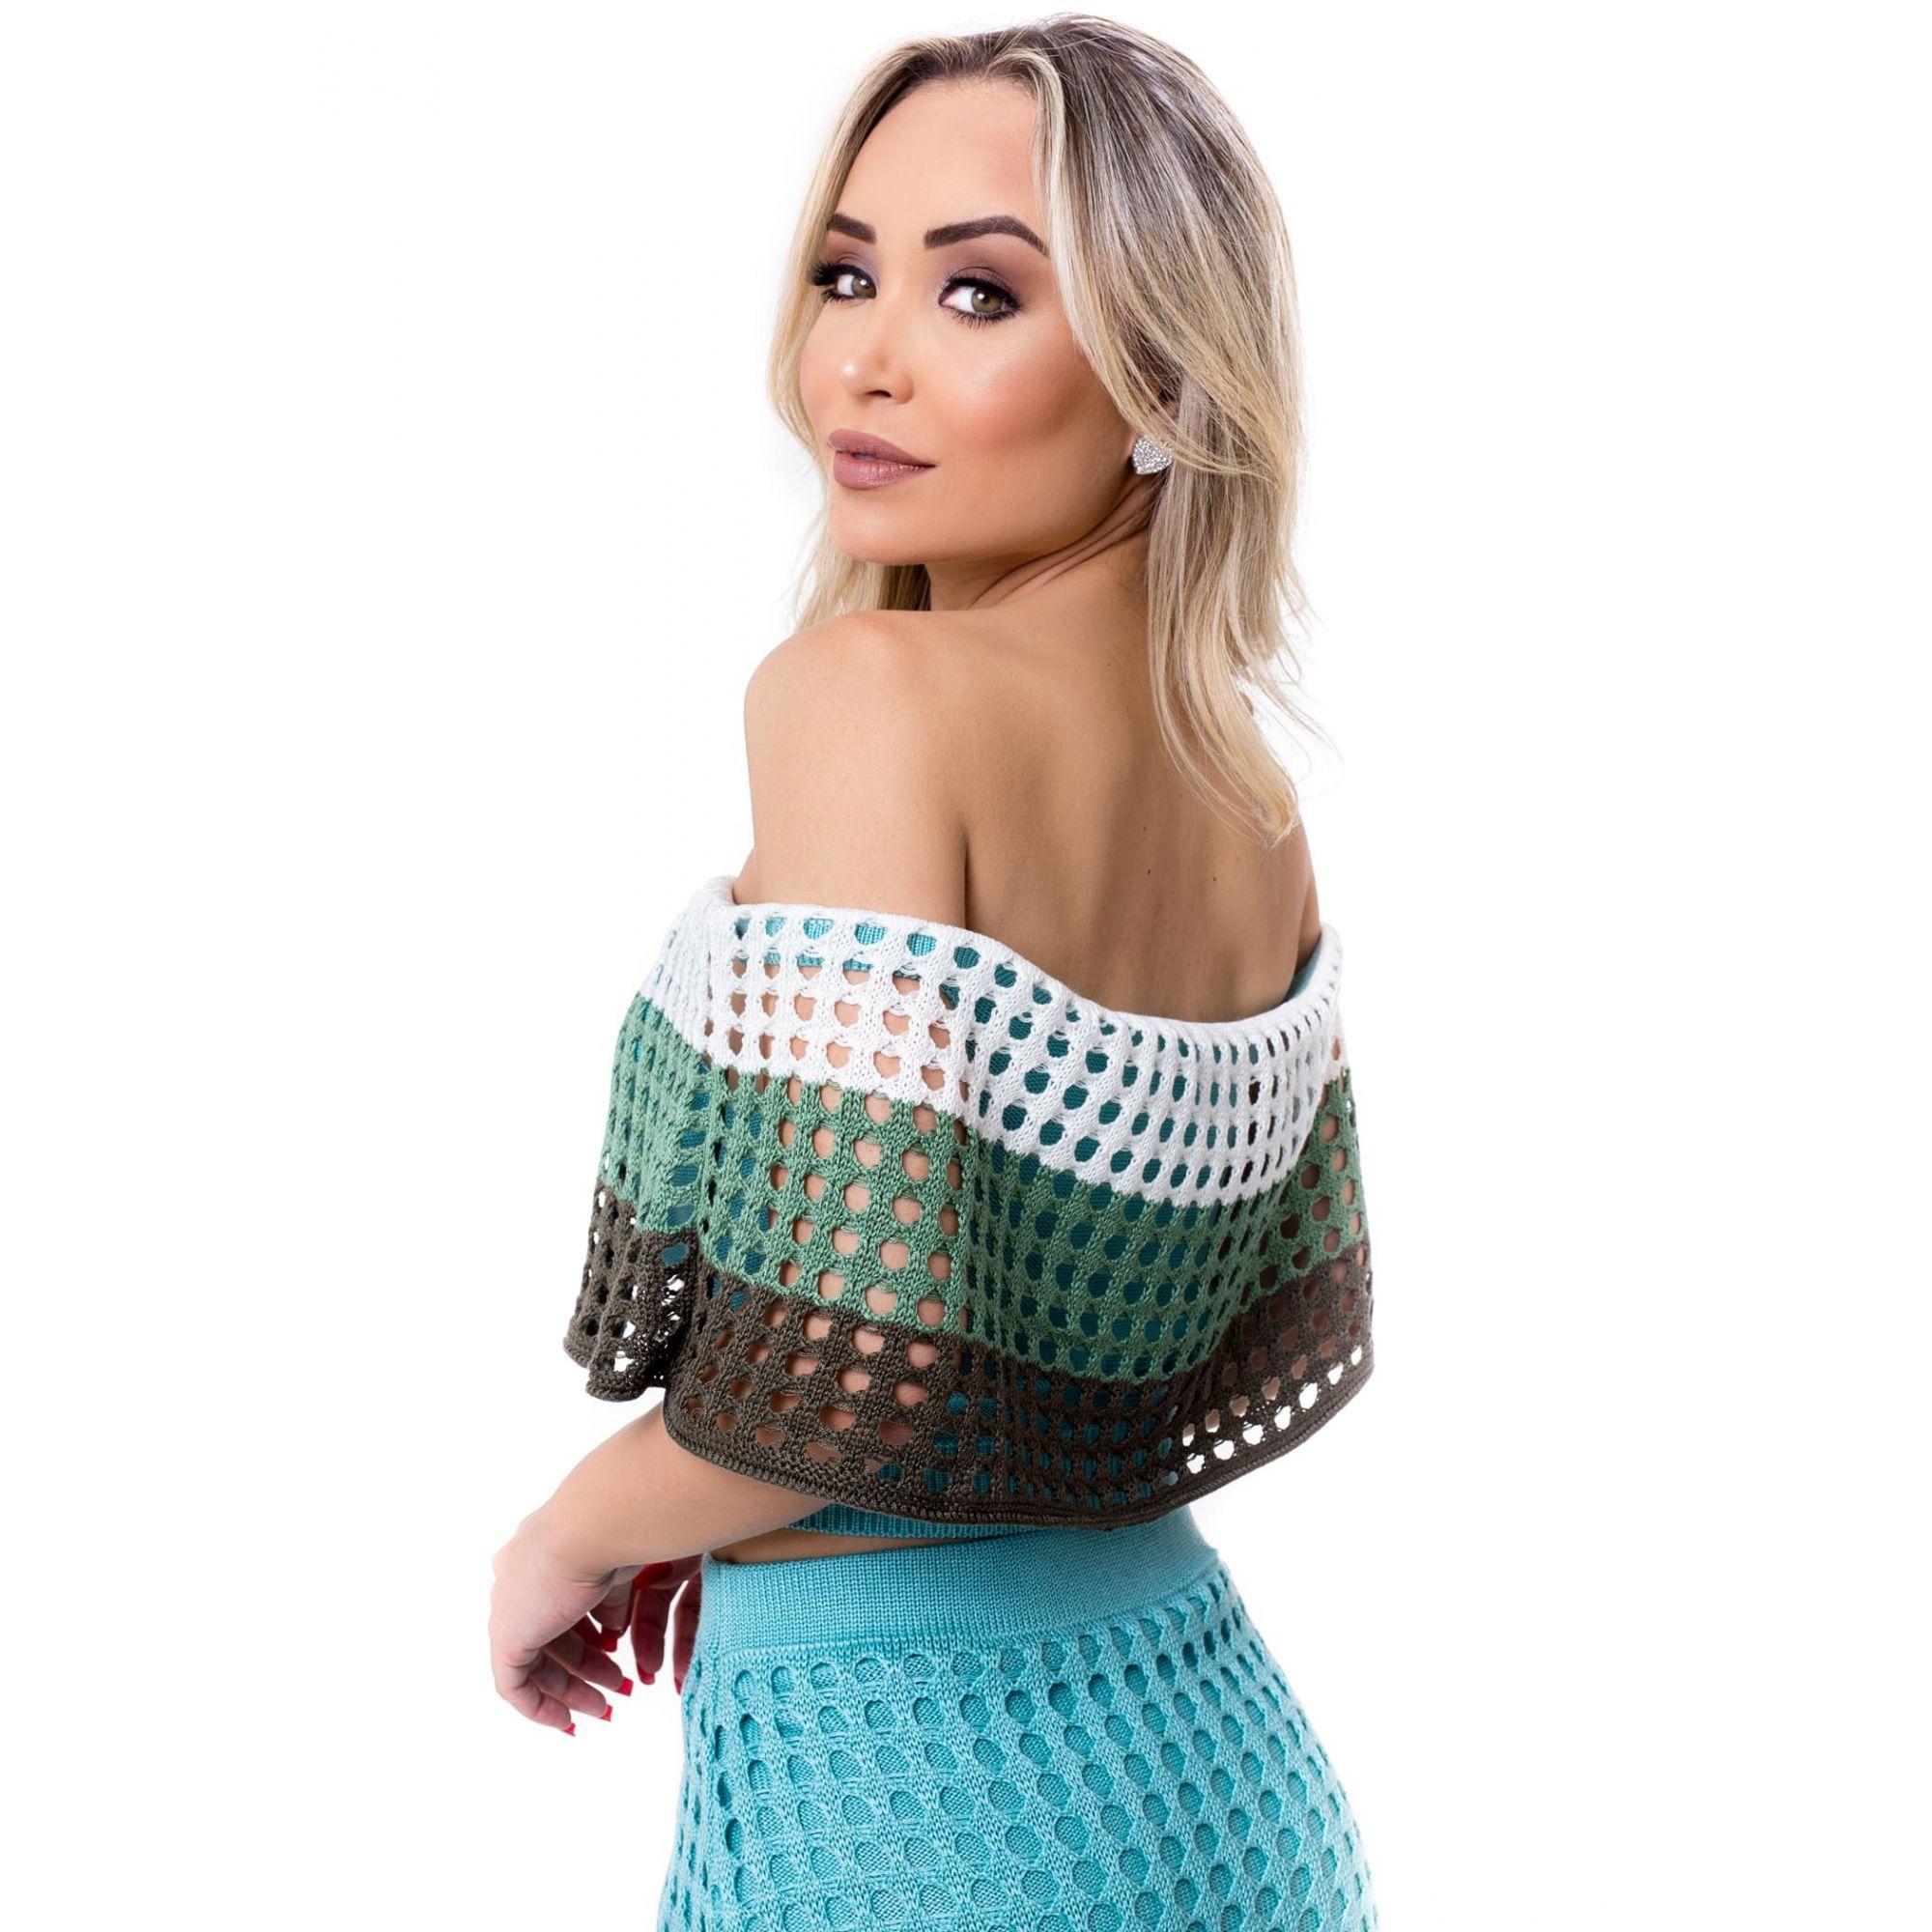 Blusa Cropped Vera Tricot Ombro a Ombro Listrado Verde / Branco